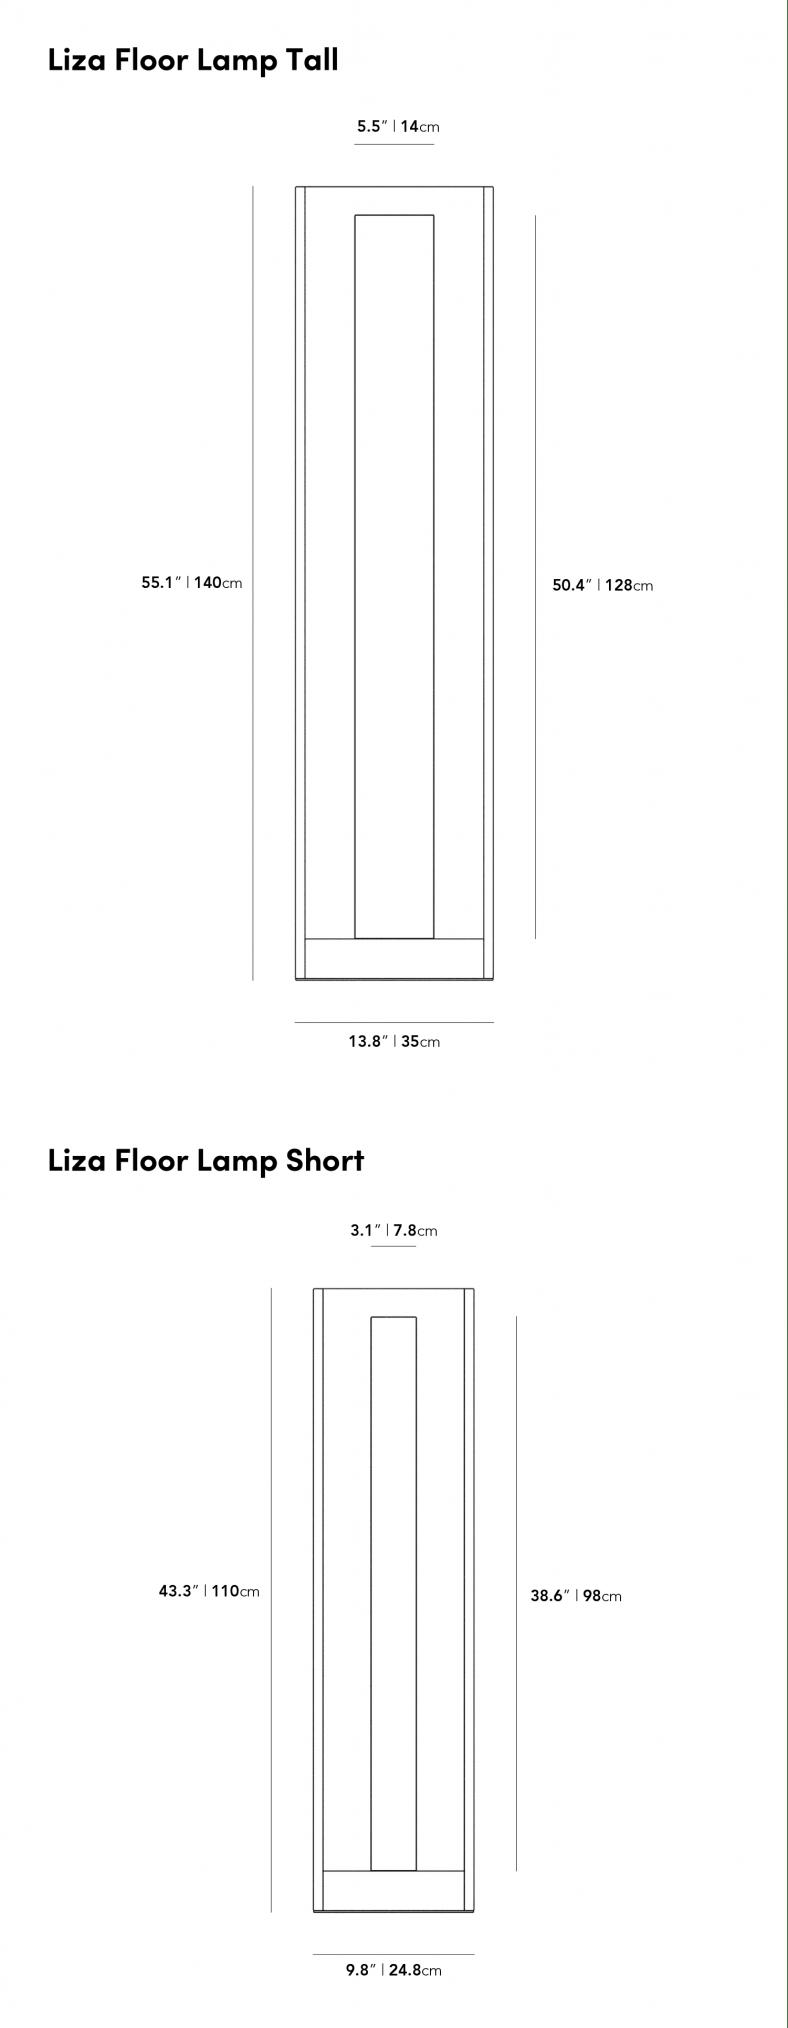 Dimensions for Liza Floor Lamp